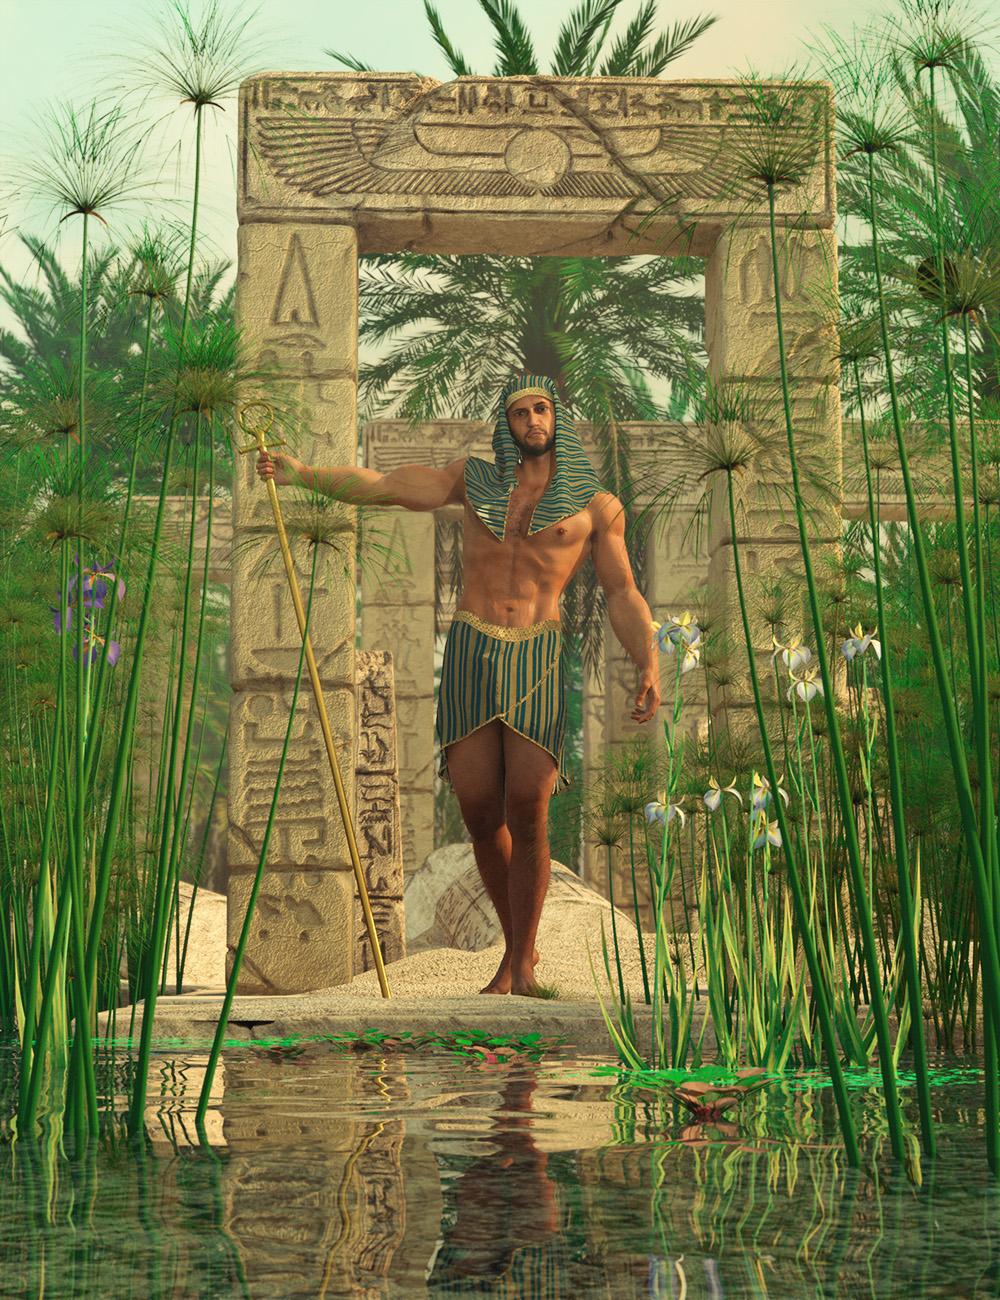 Nile Papyrus Plants by: MartinJFrost, 3D Models by Daz 3D